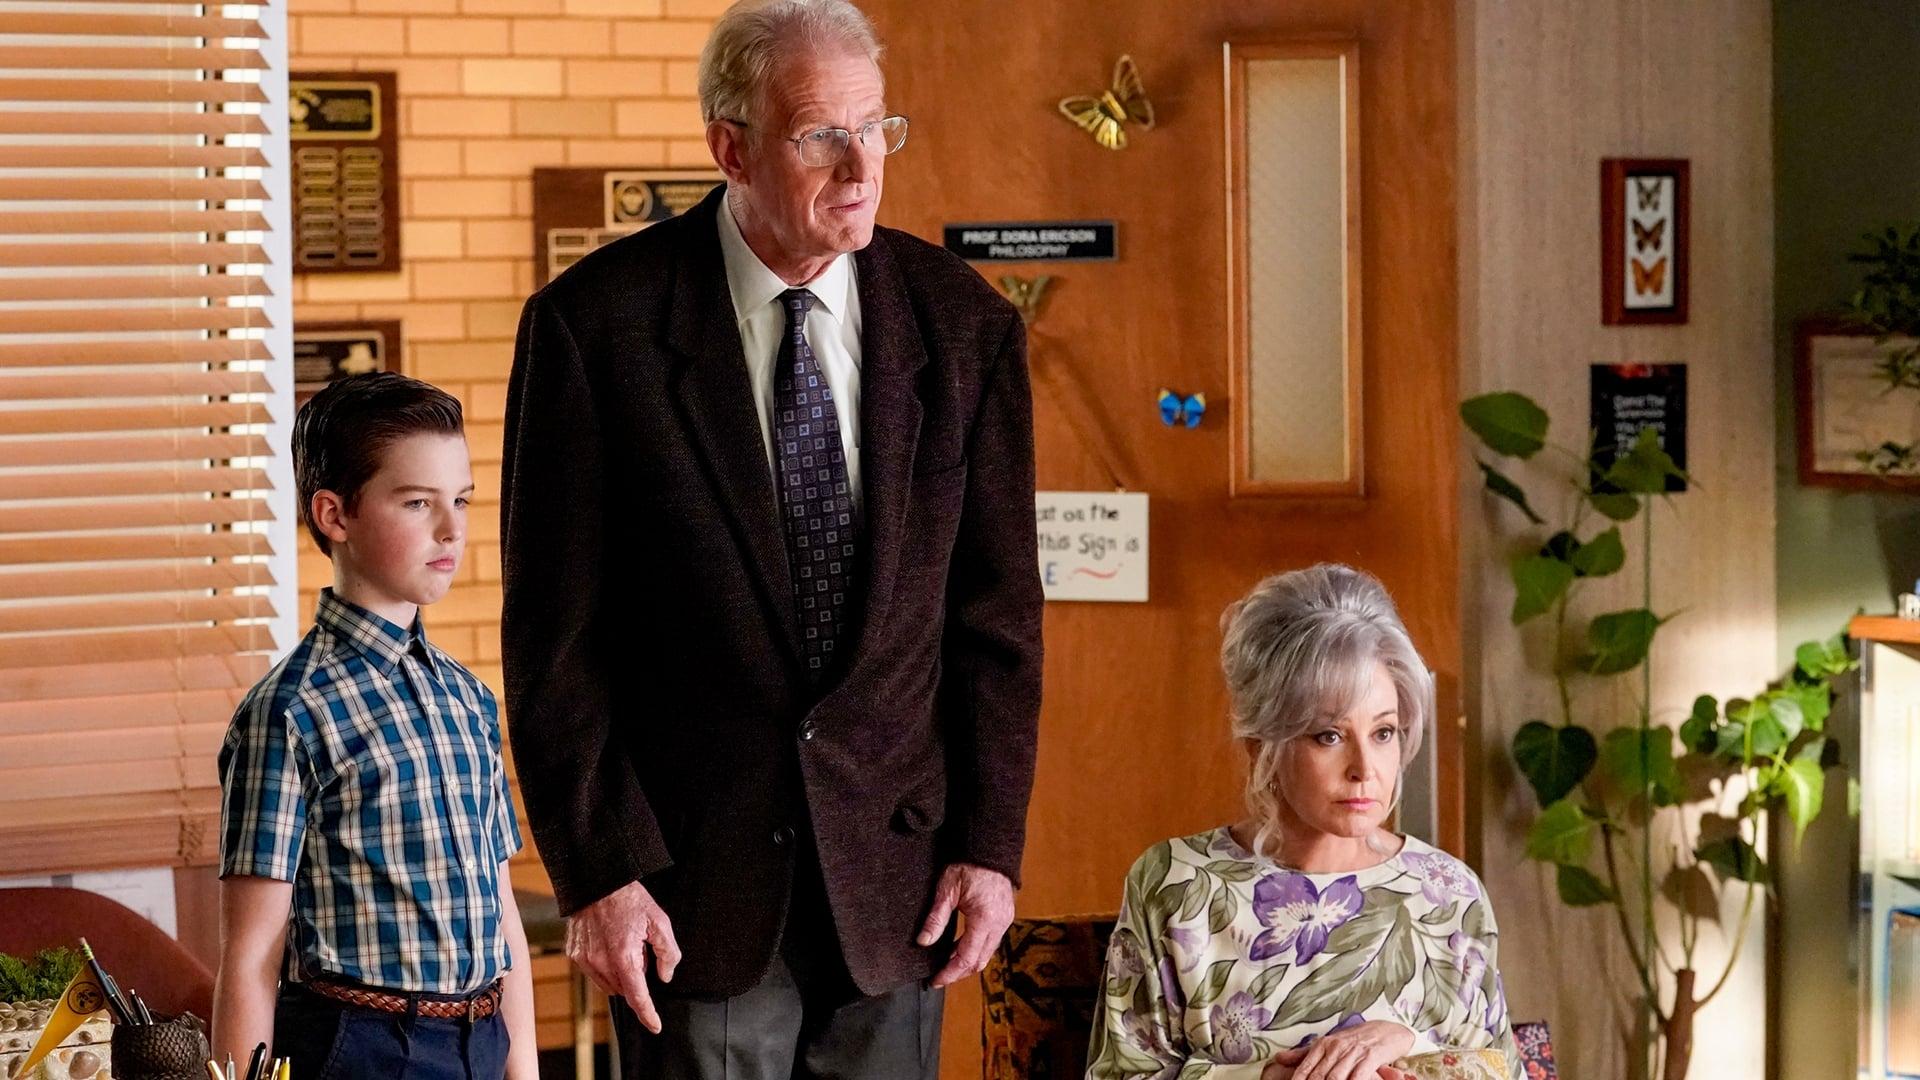 Young Sheldon - Season 4 Episode 8 : An Existential Crisis and a Bear That Makes Bubbles